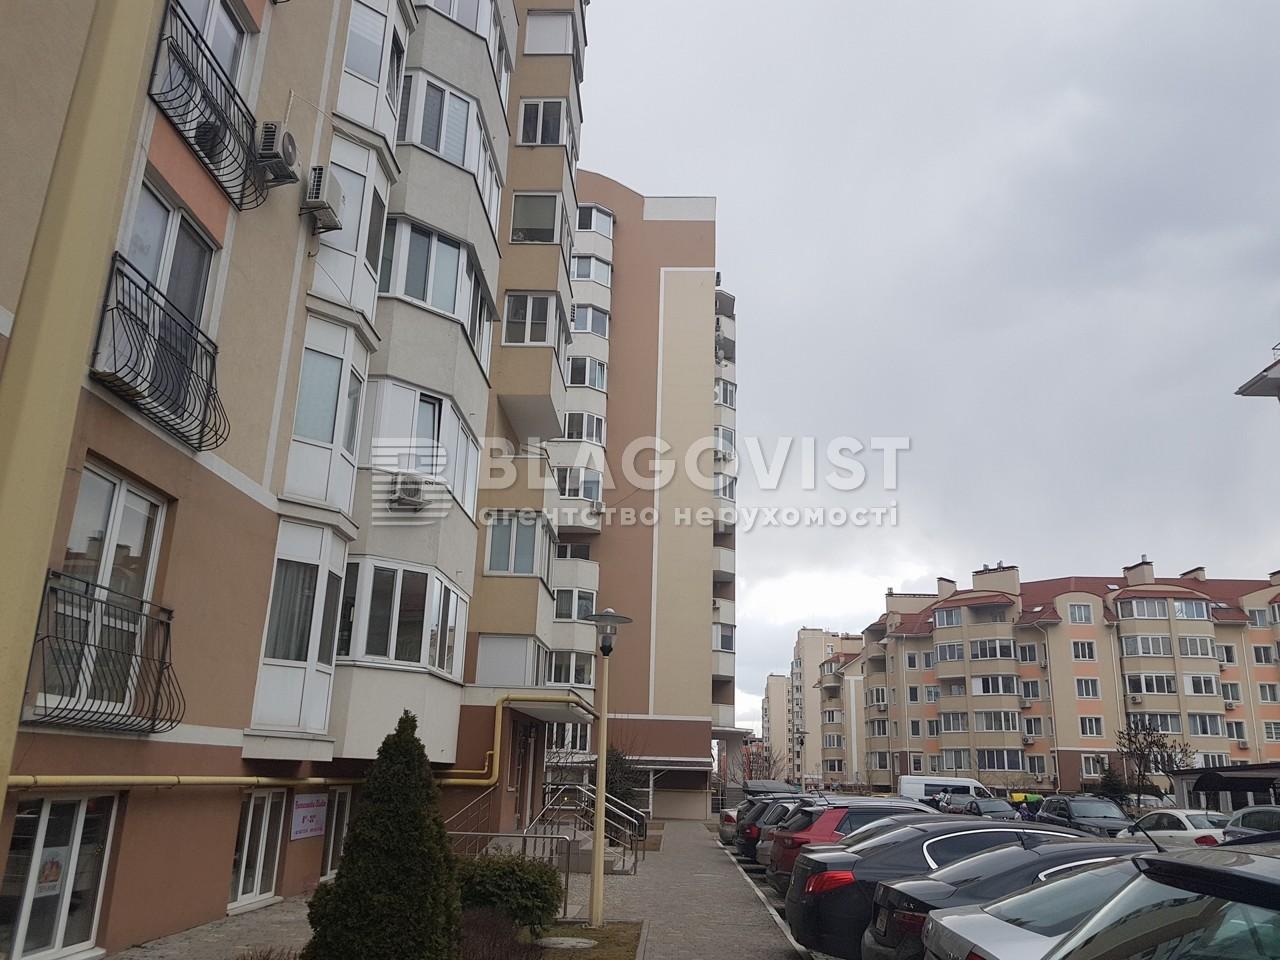 Квартира E-40784, Леси Украинки, 4, Софиевская Борщаговка - Фото 2